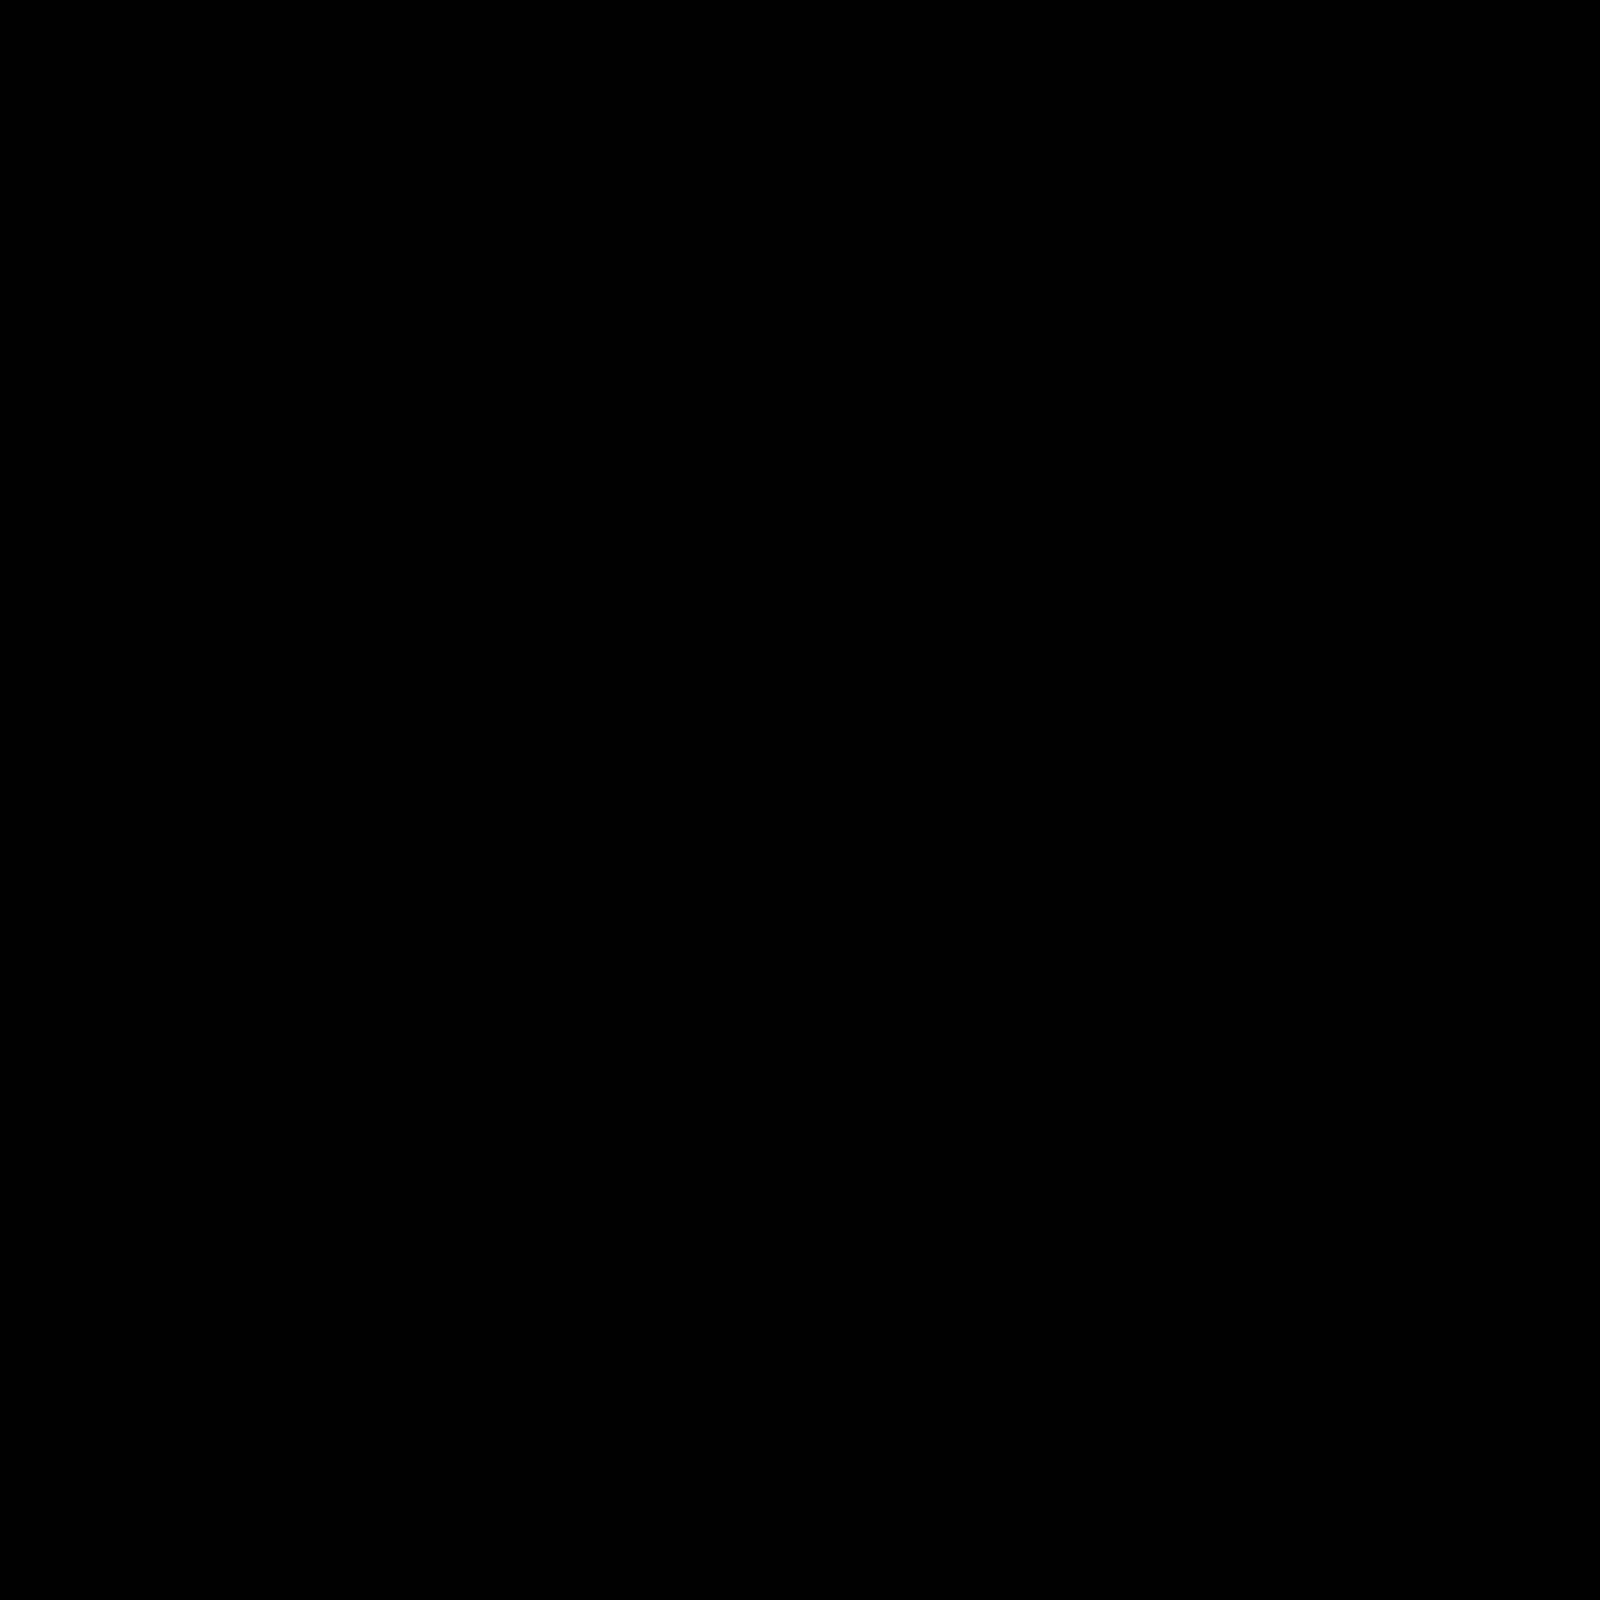 Weighbridge icon free download. Humans clipart weighing machine